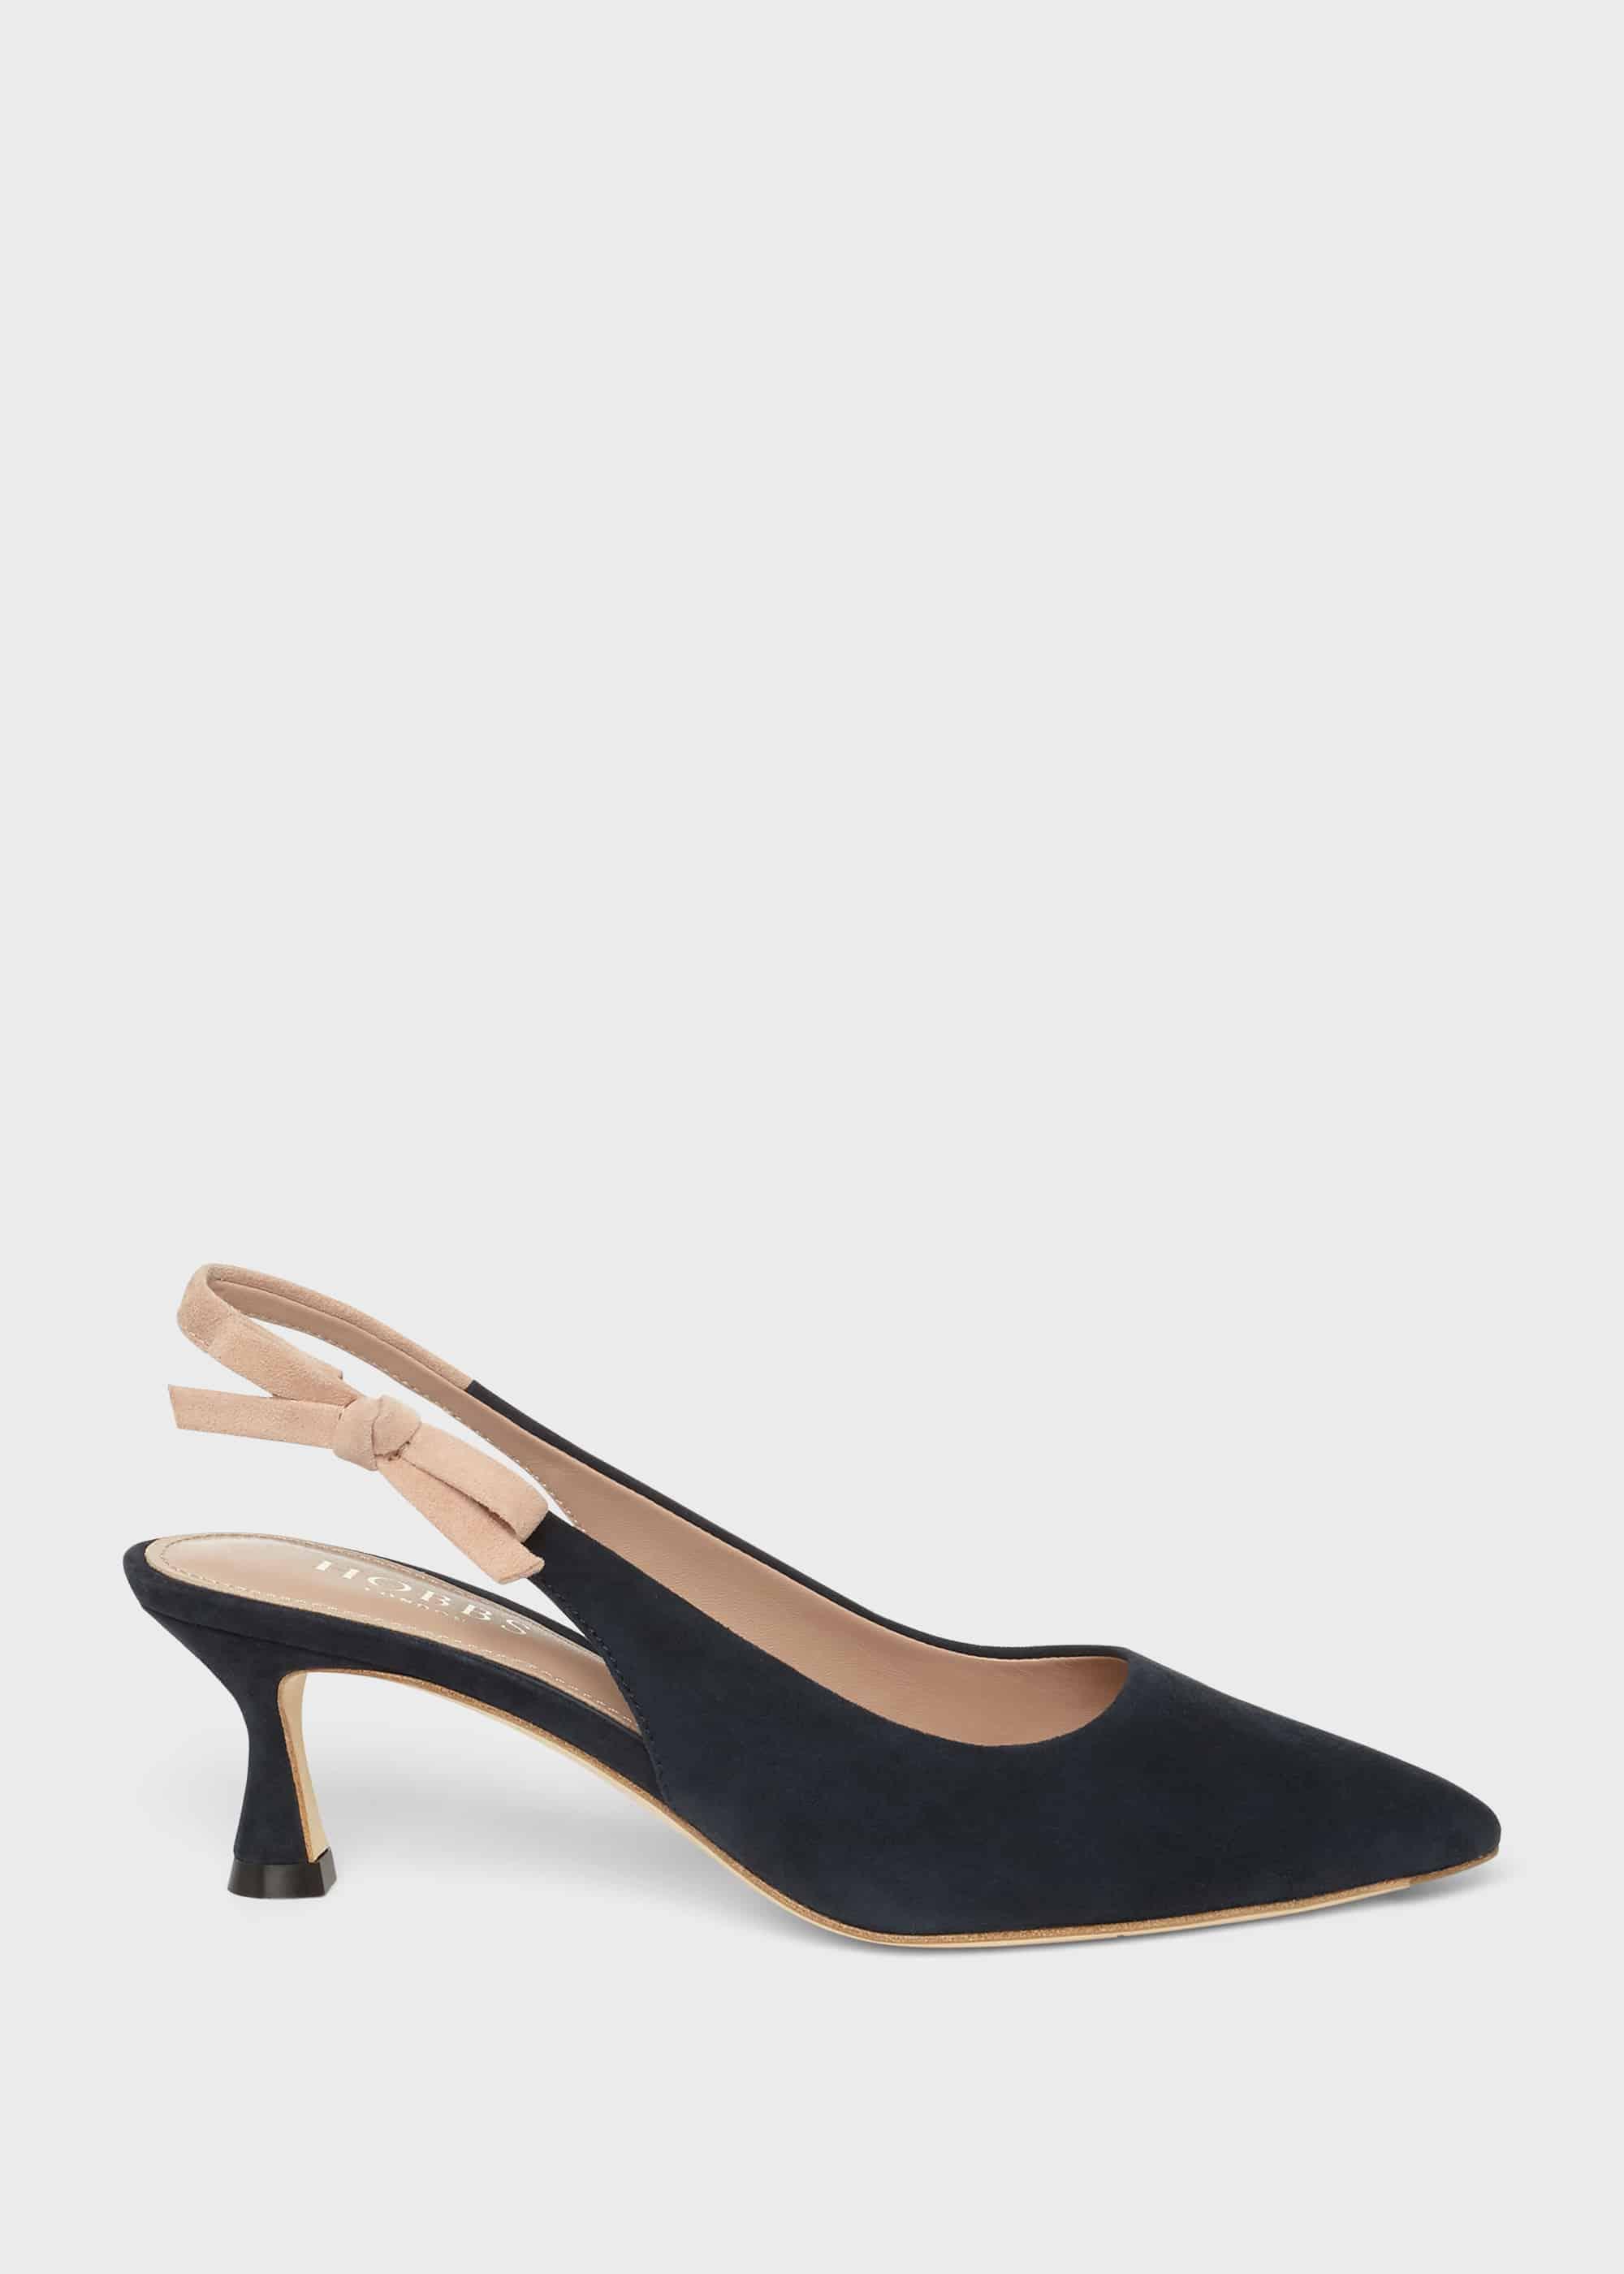 Hobbs Women Julia Suede Slingback Shoes